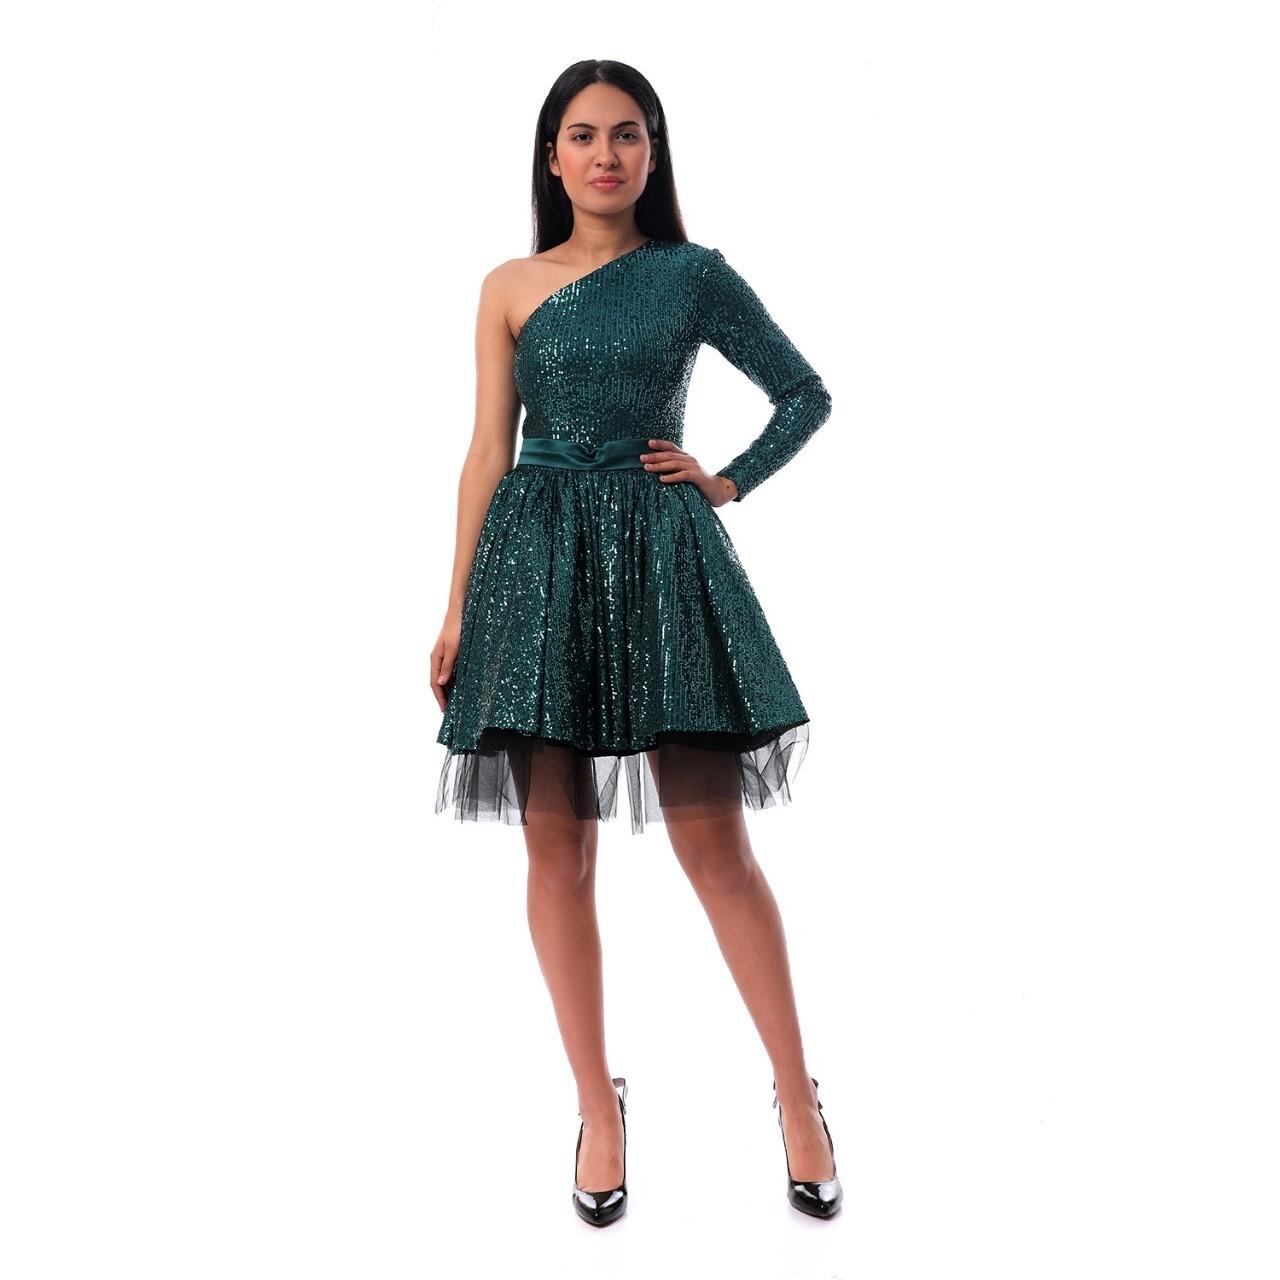 8511 Soiree Dress - Dark Green